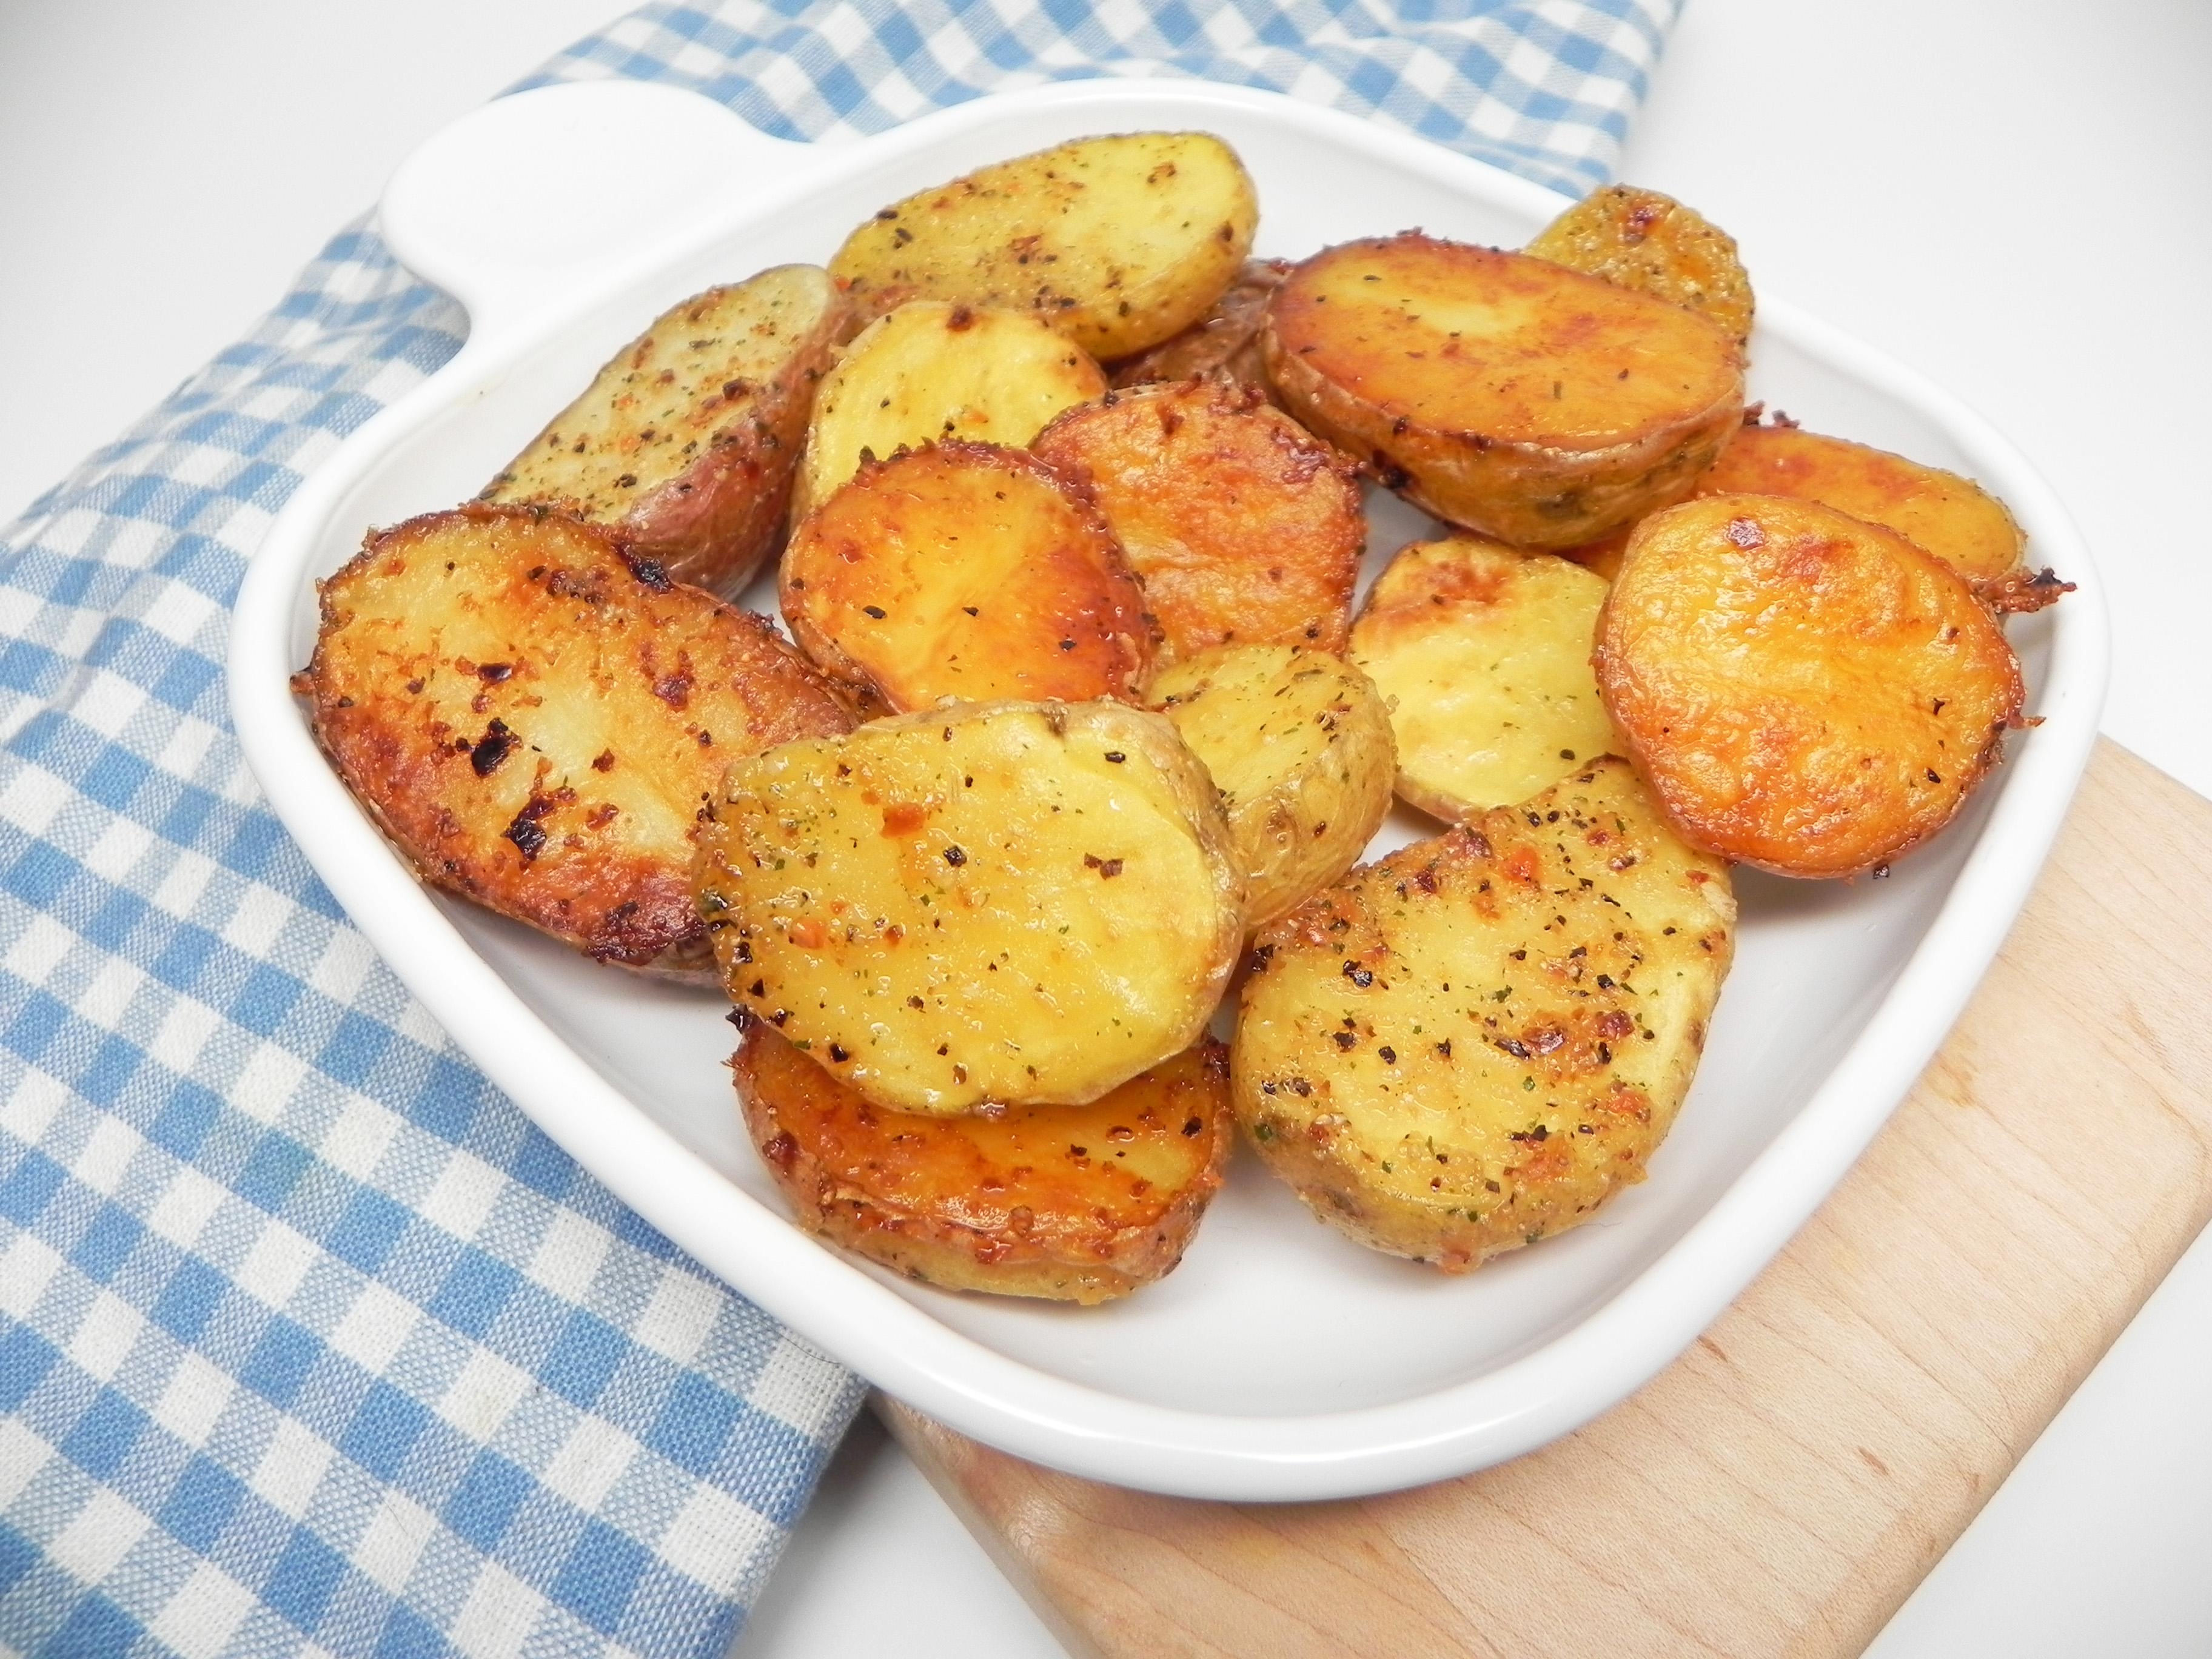 Italian-Style Roasted Baby Potatoes